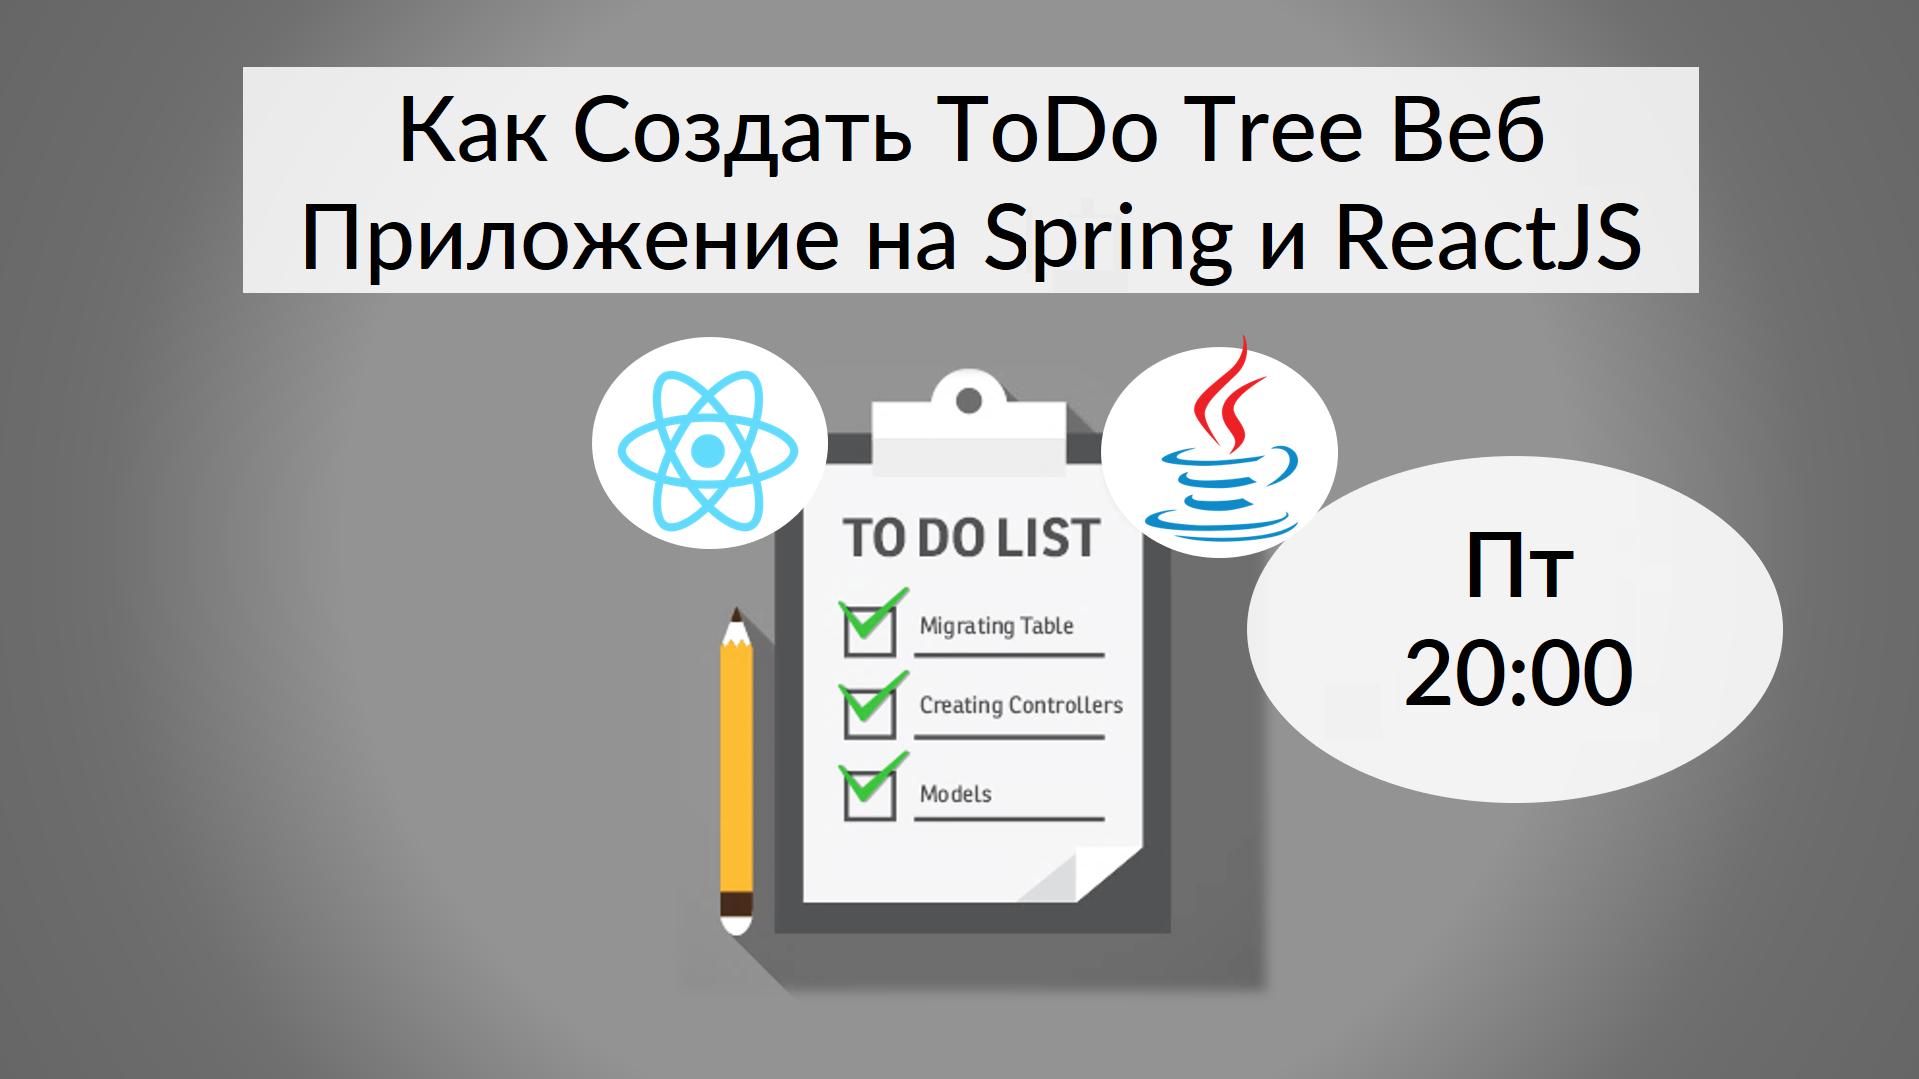 Spring и ReactJS